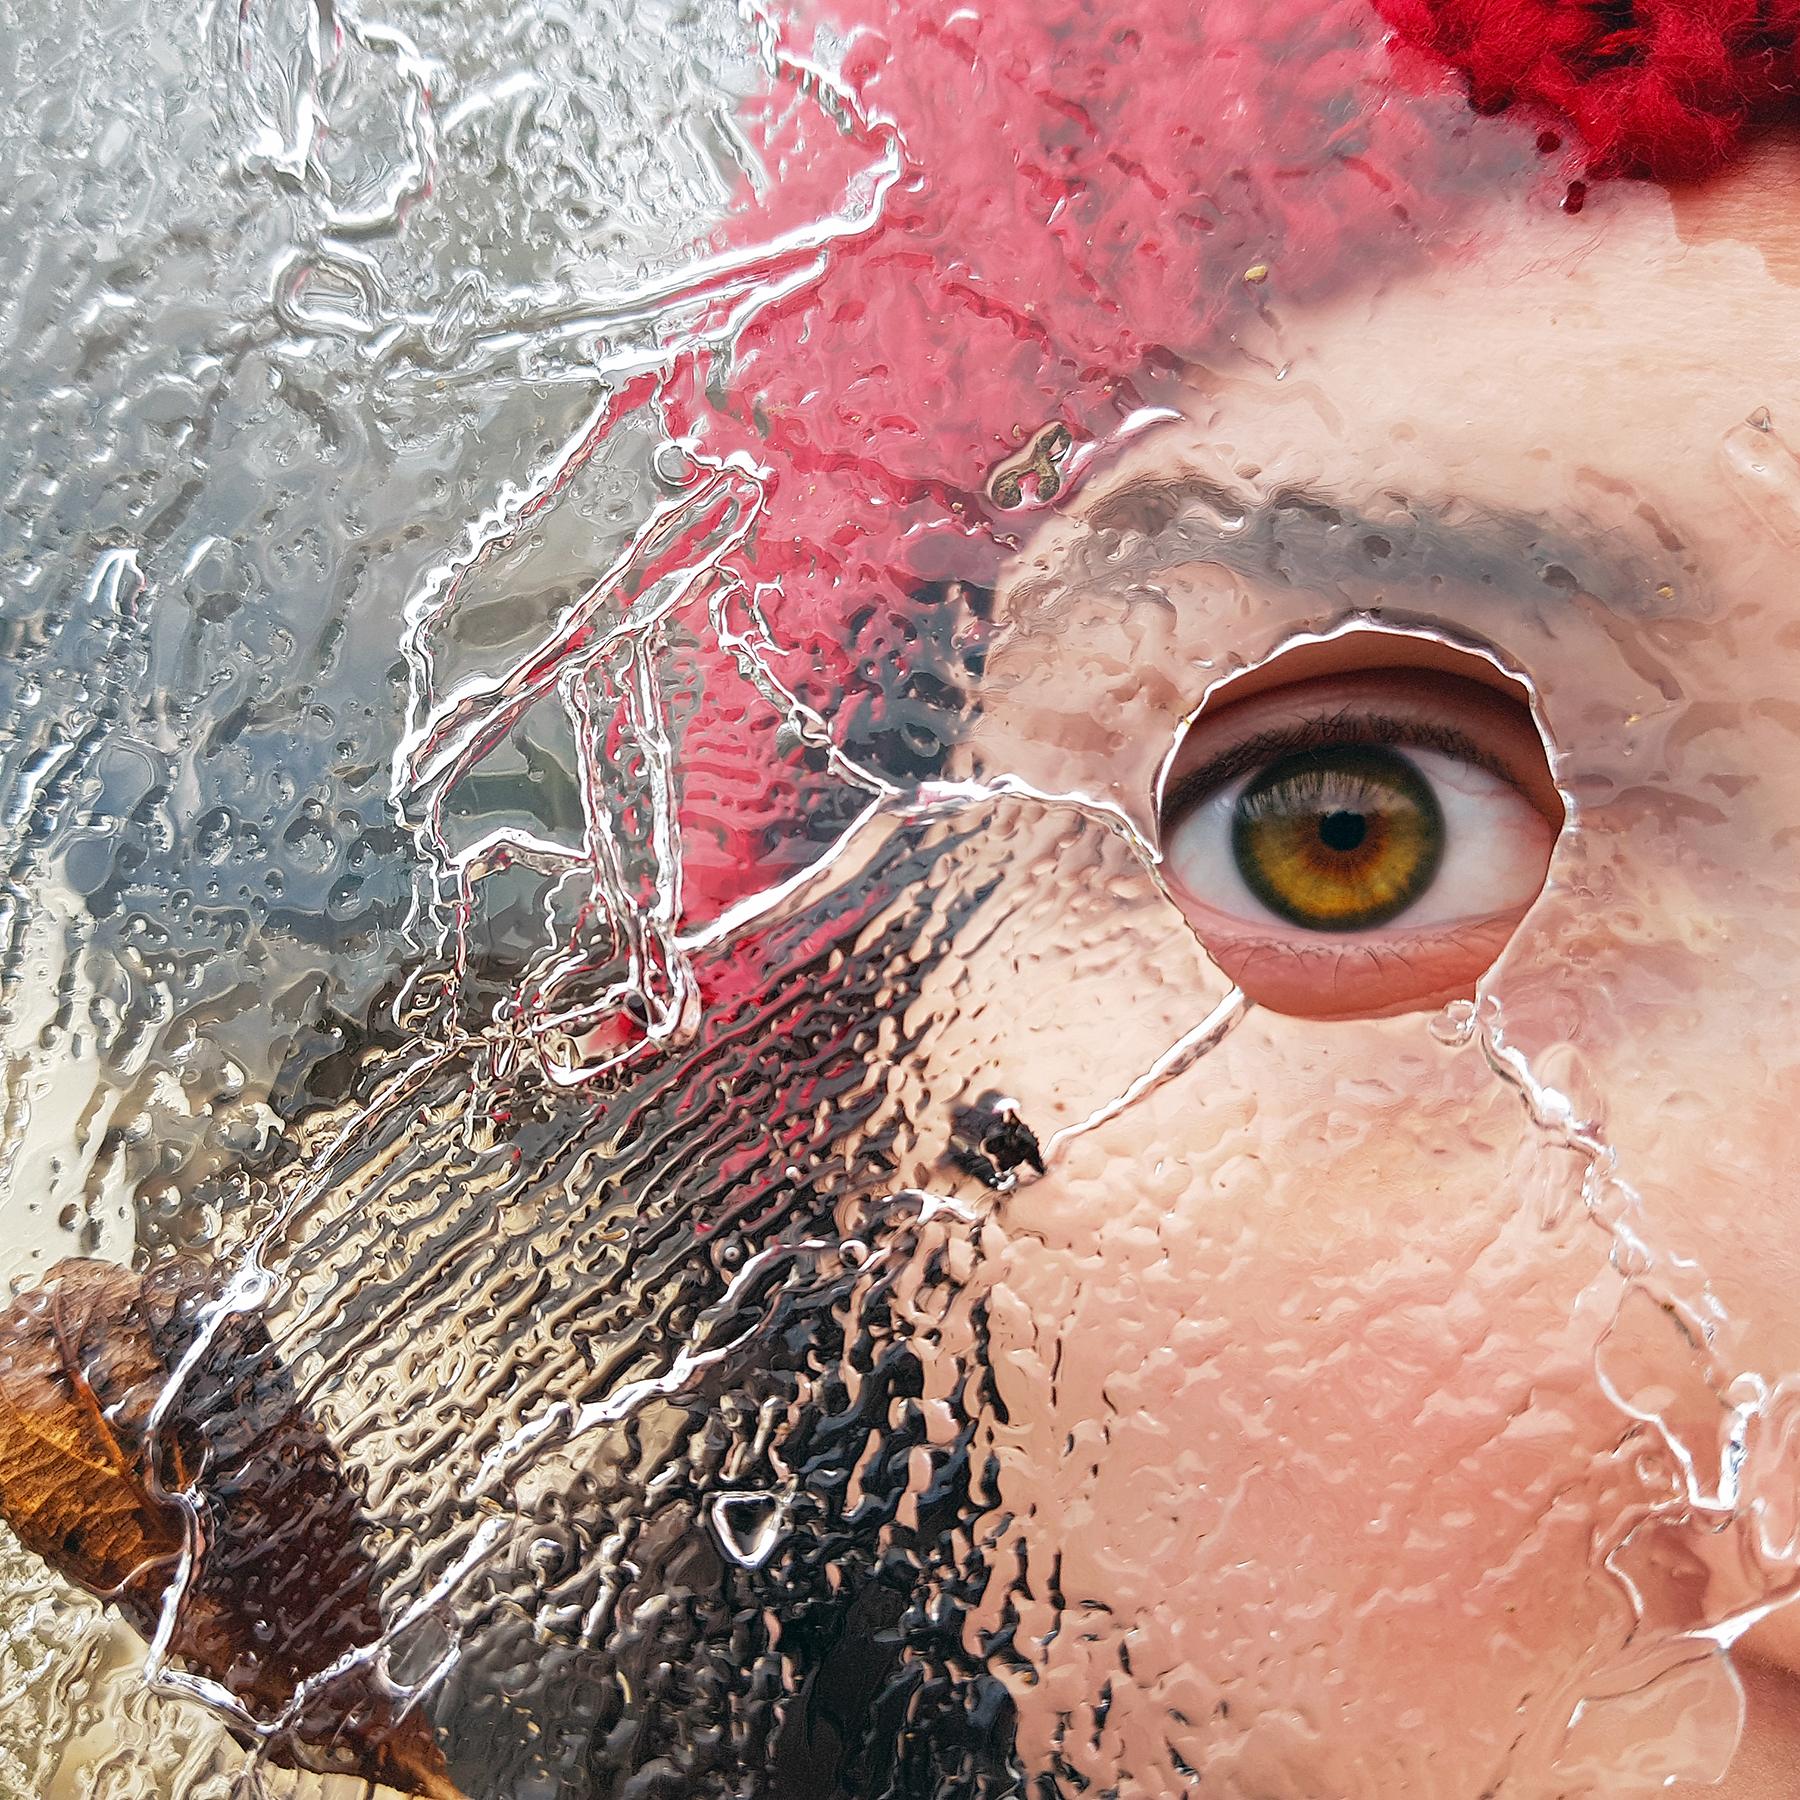 Maja_Strgar Kurecic_Through the Ice.jpg